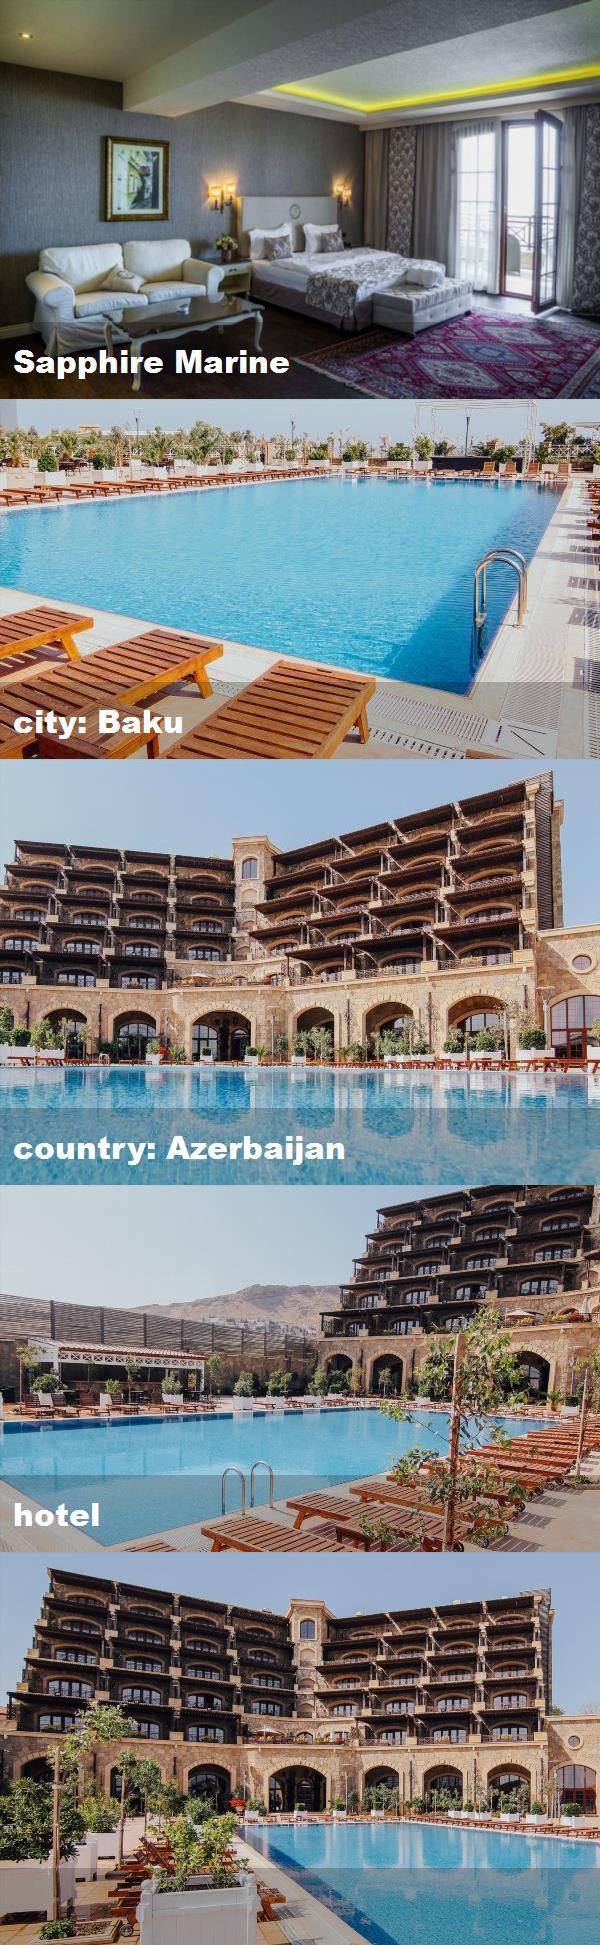 Sapphire Marine City Baku Country Azerbaijan Hotel Hotel Marine Mansions